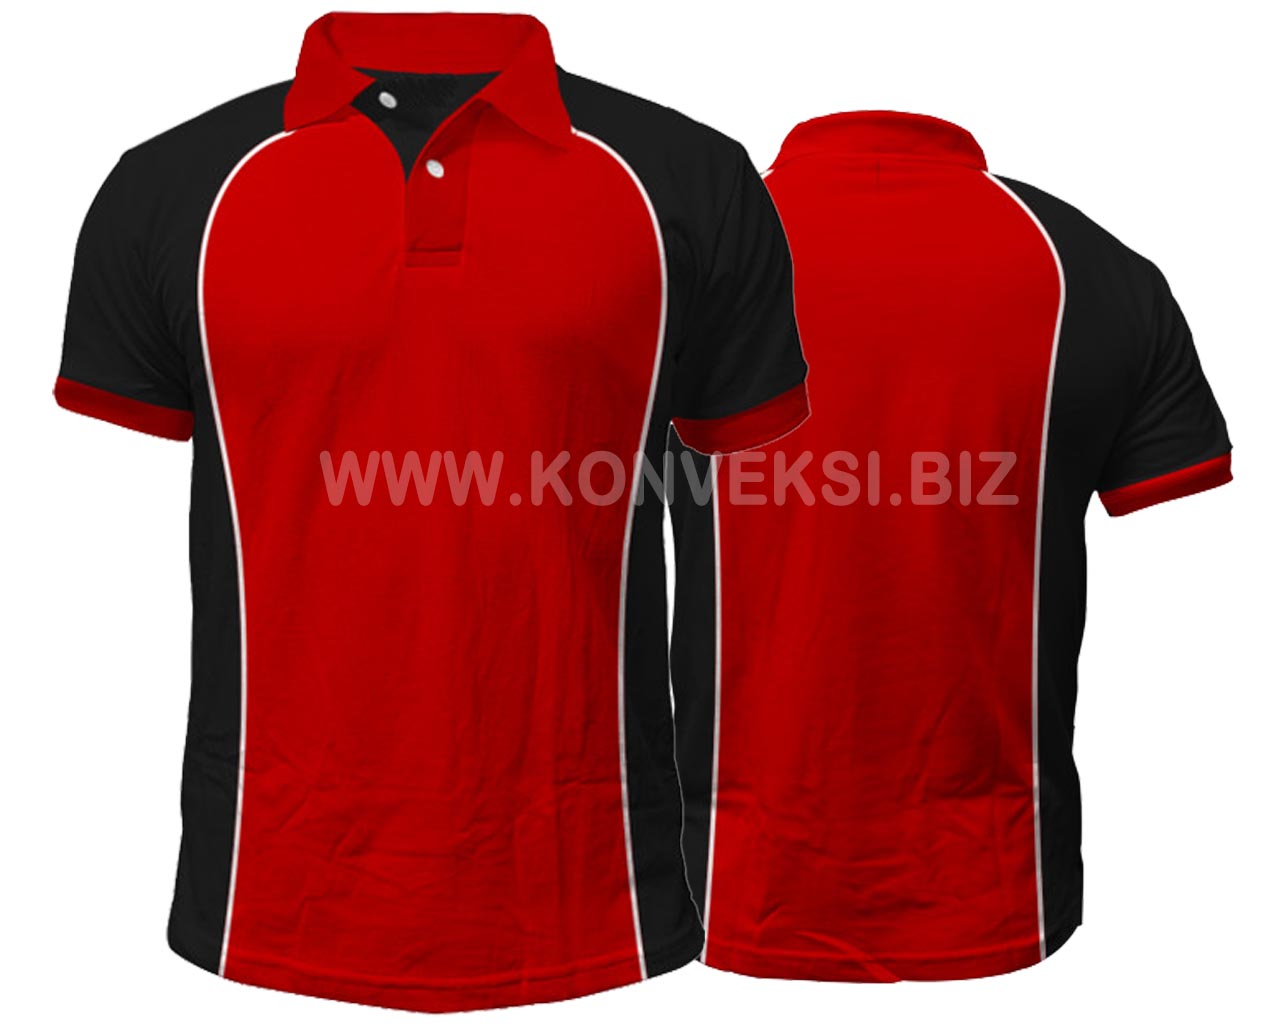 Kaos Kerah Merah Hitam Desain Keren